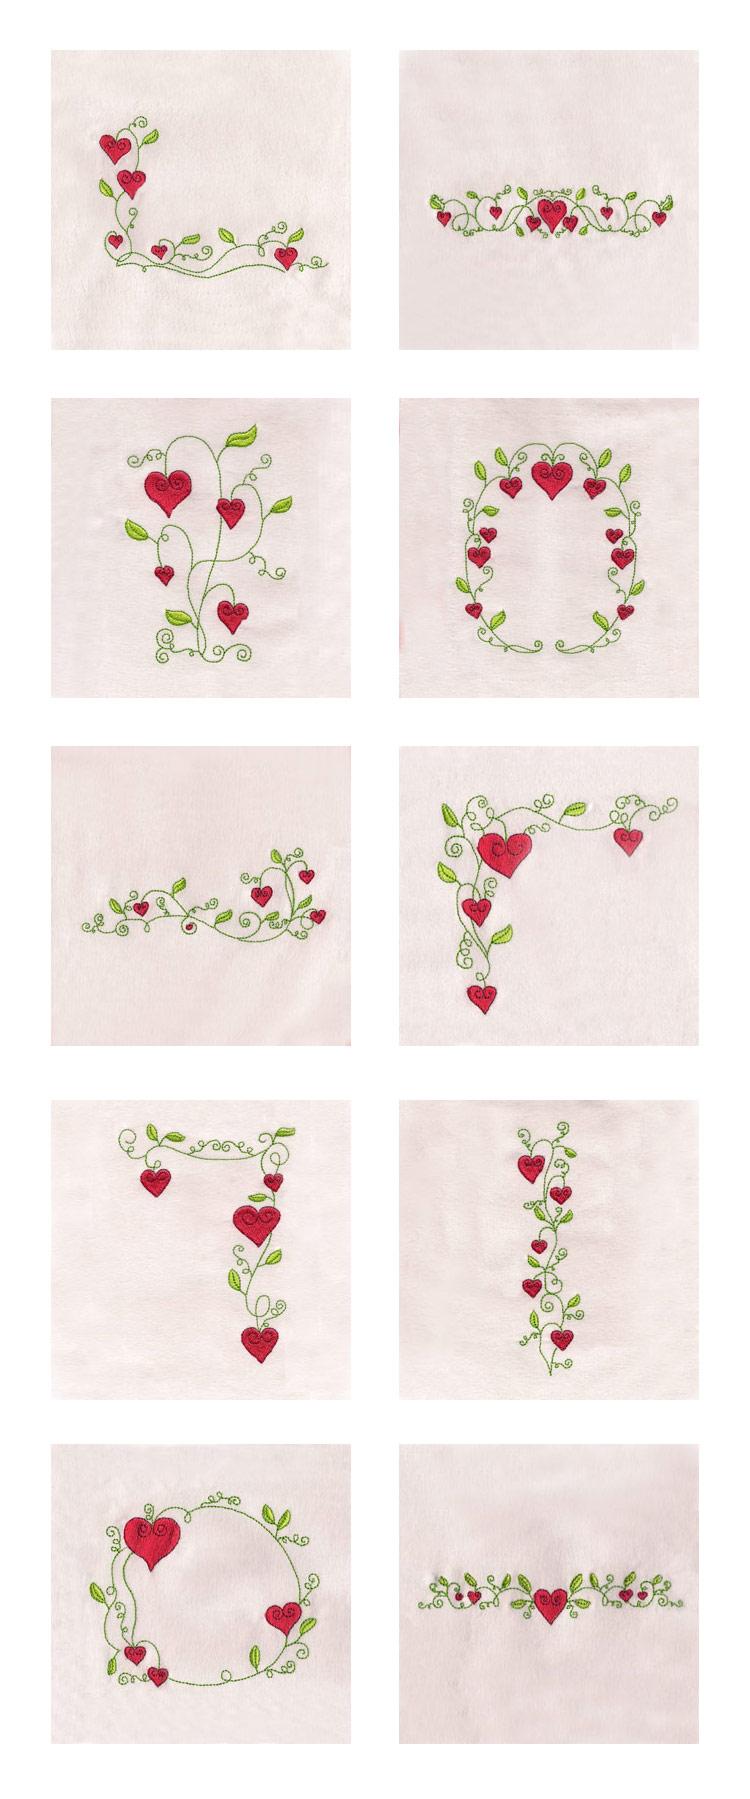 Embroidery machine designs valentine flowers borders set